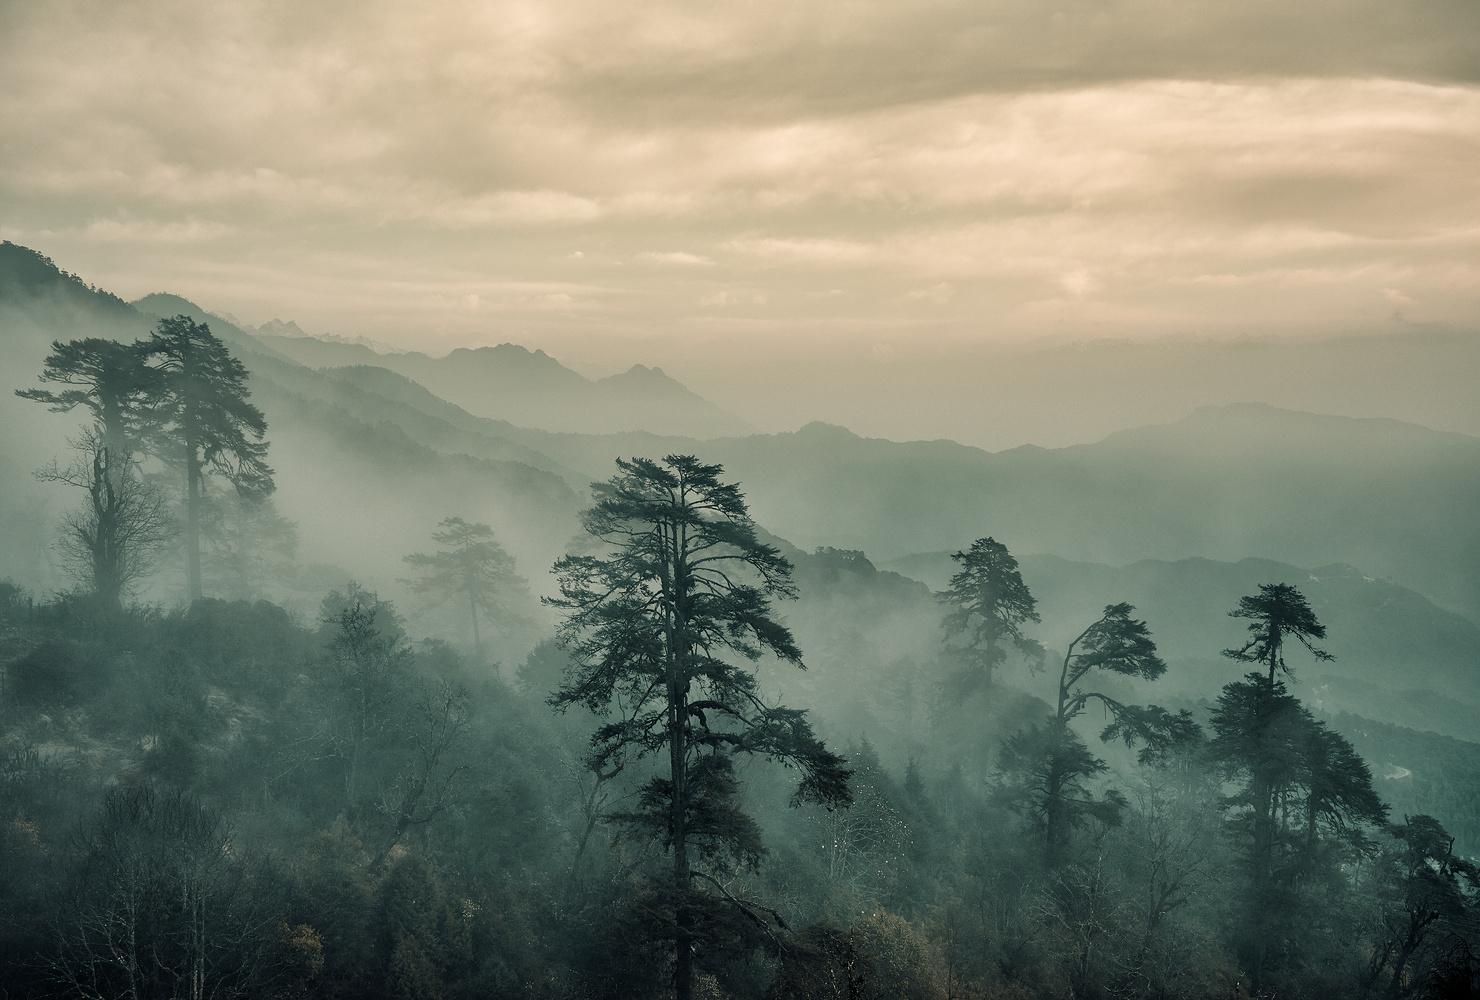 Bhutan: A Strange Mood. by Sebastian Leonhardt